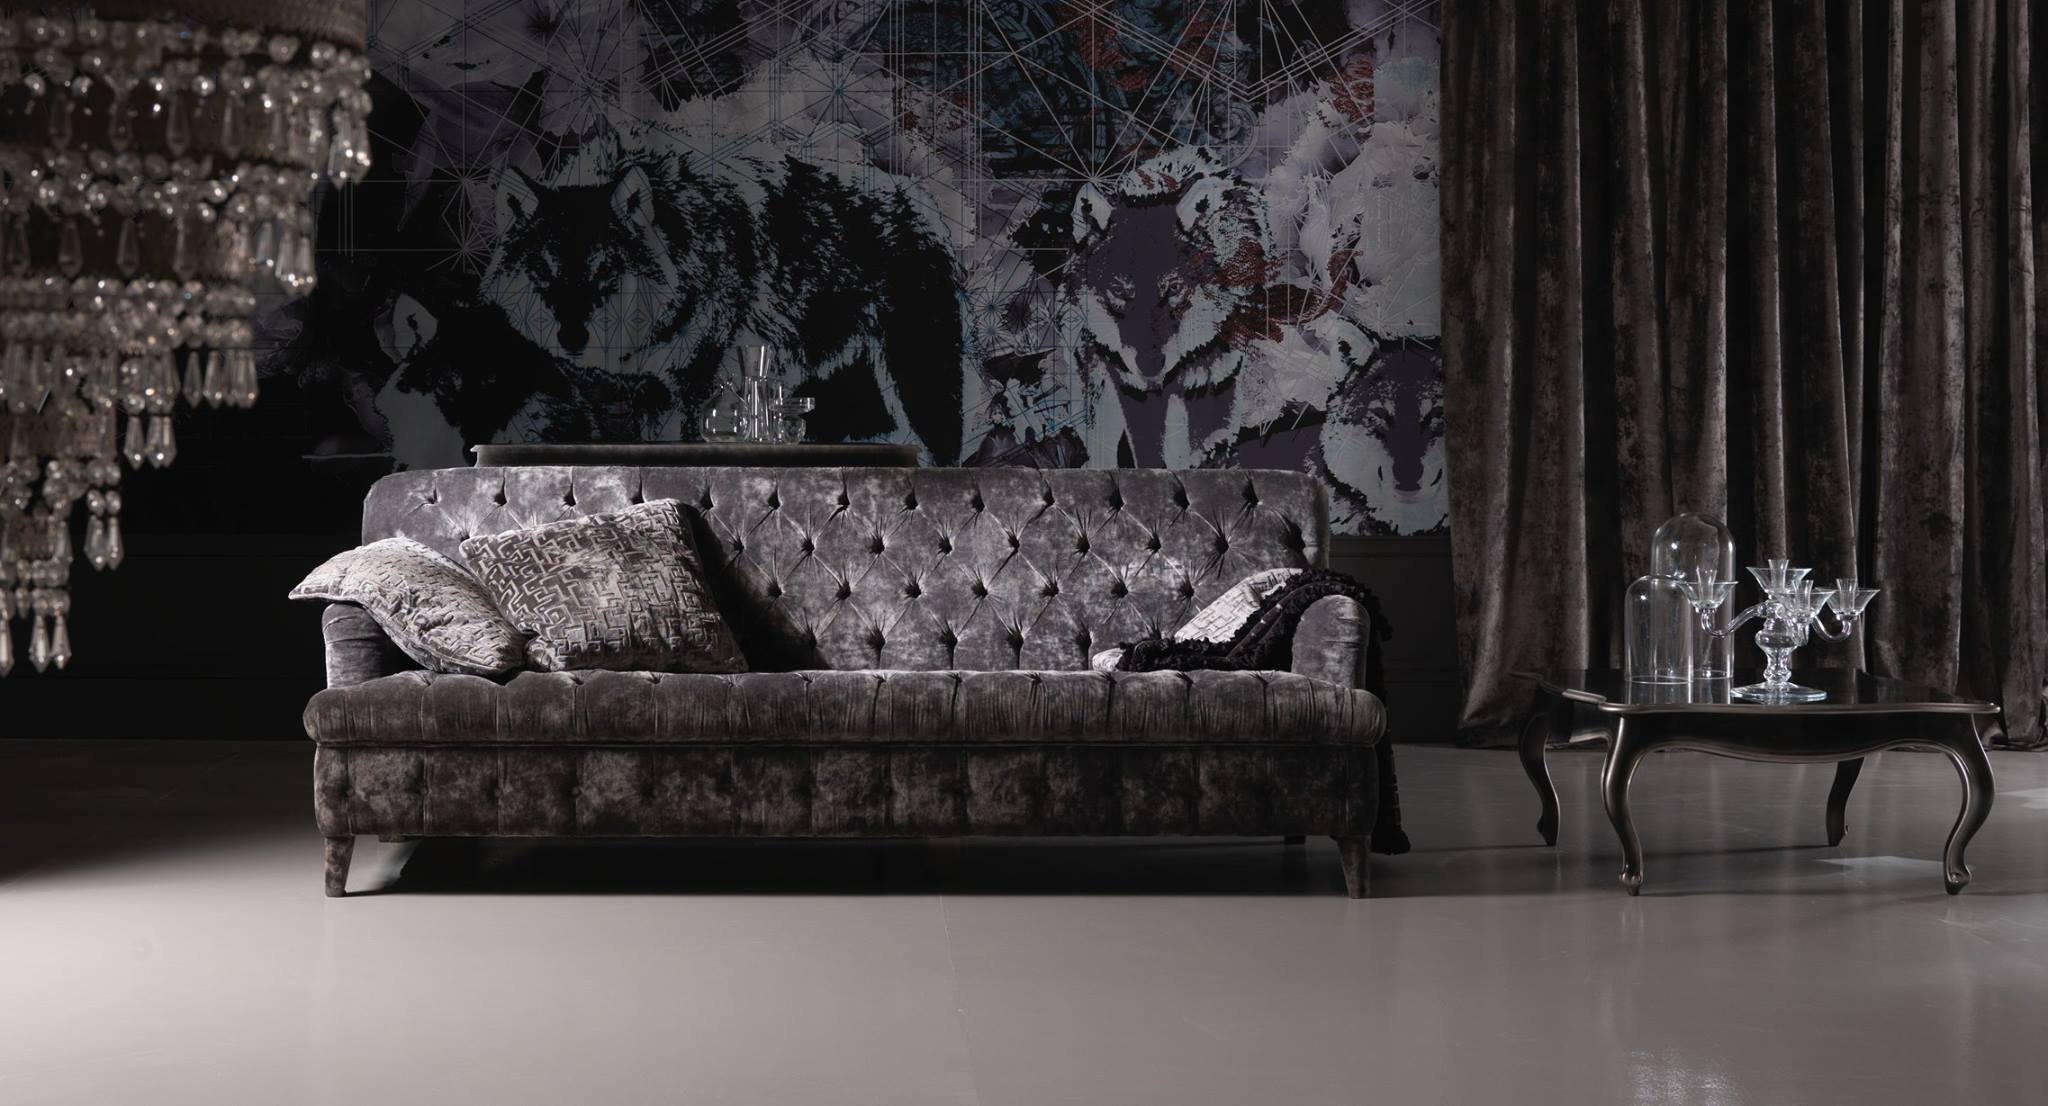 veracchi_mobili_italian_furniture_luxury_sofa_velvet_grey